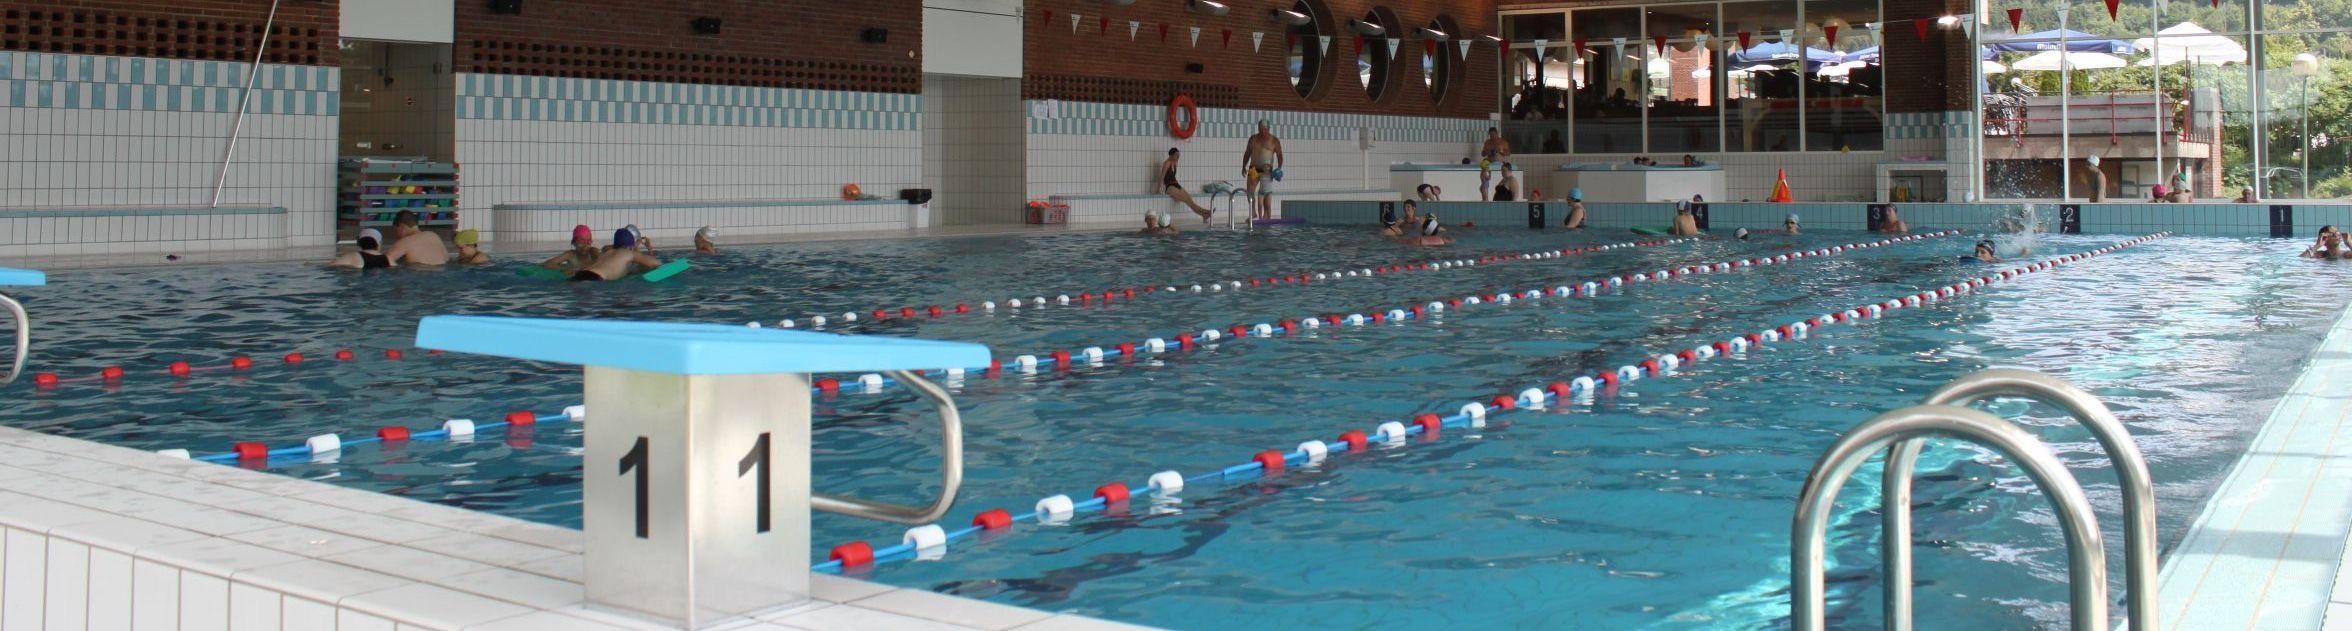 Piscine communale horaires et tarifs sport agenda for Horaire piscine st lo